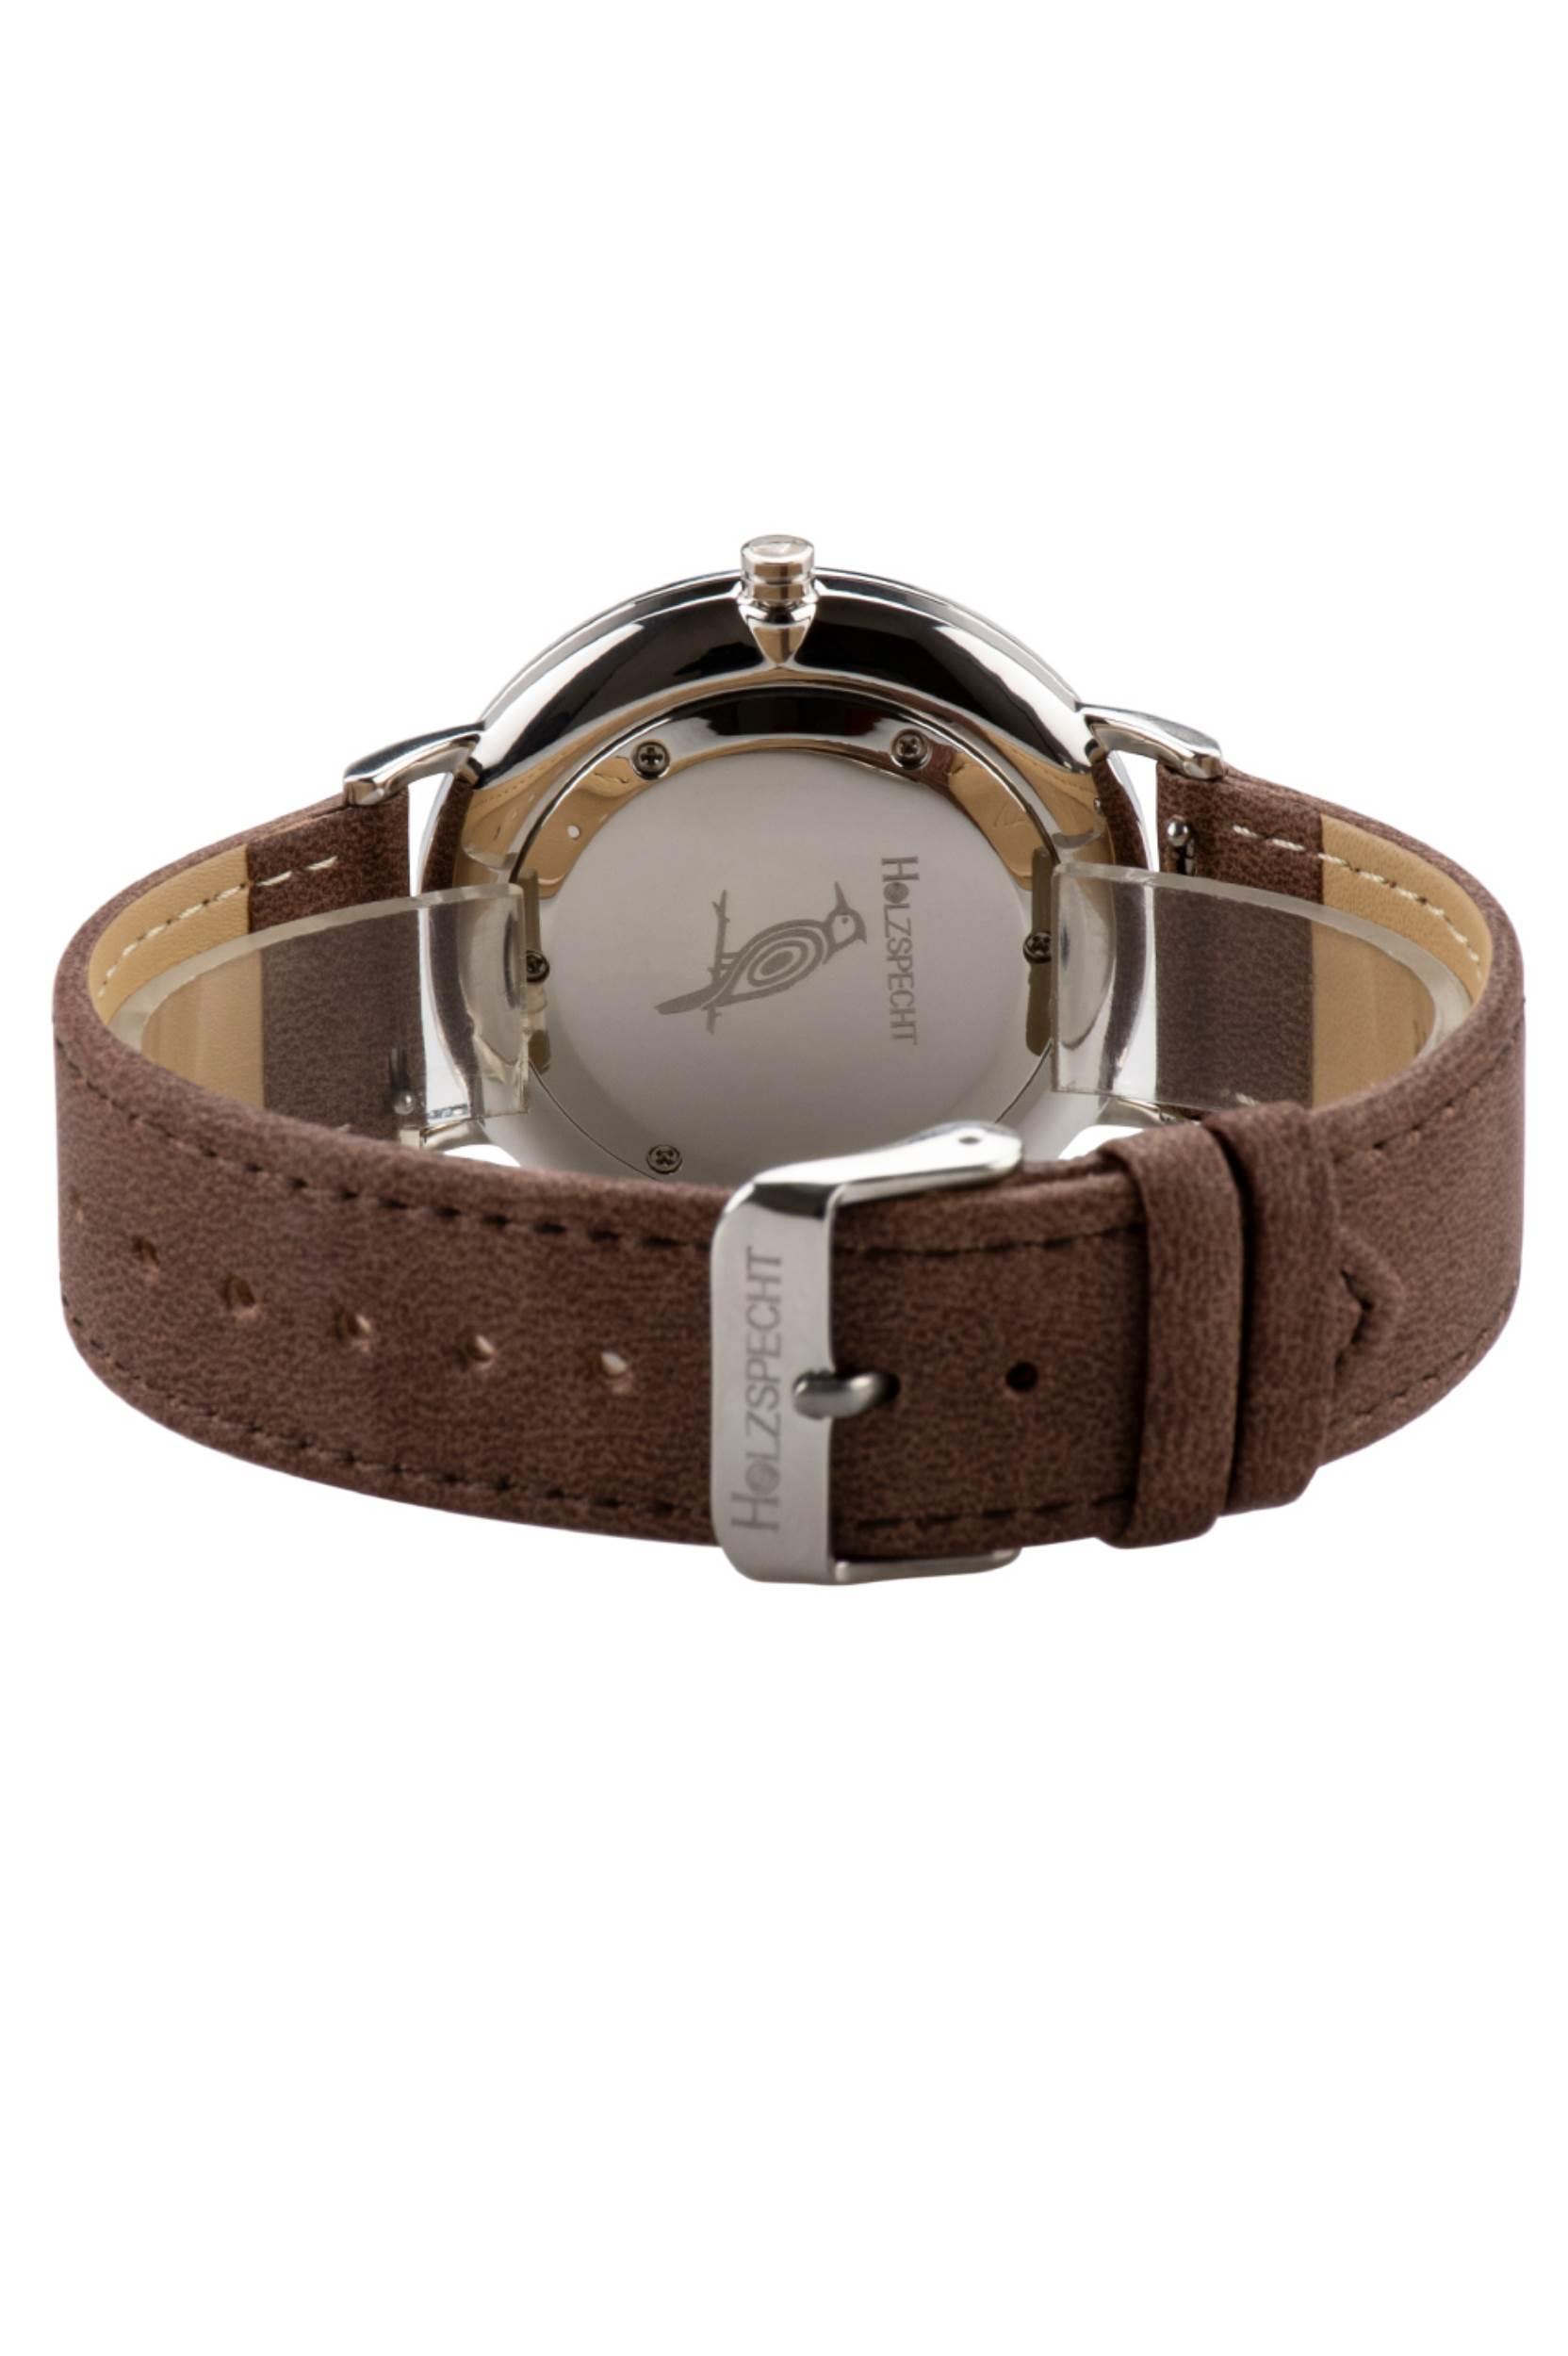 Armbanduhr Karwendel mit veganem Leder